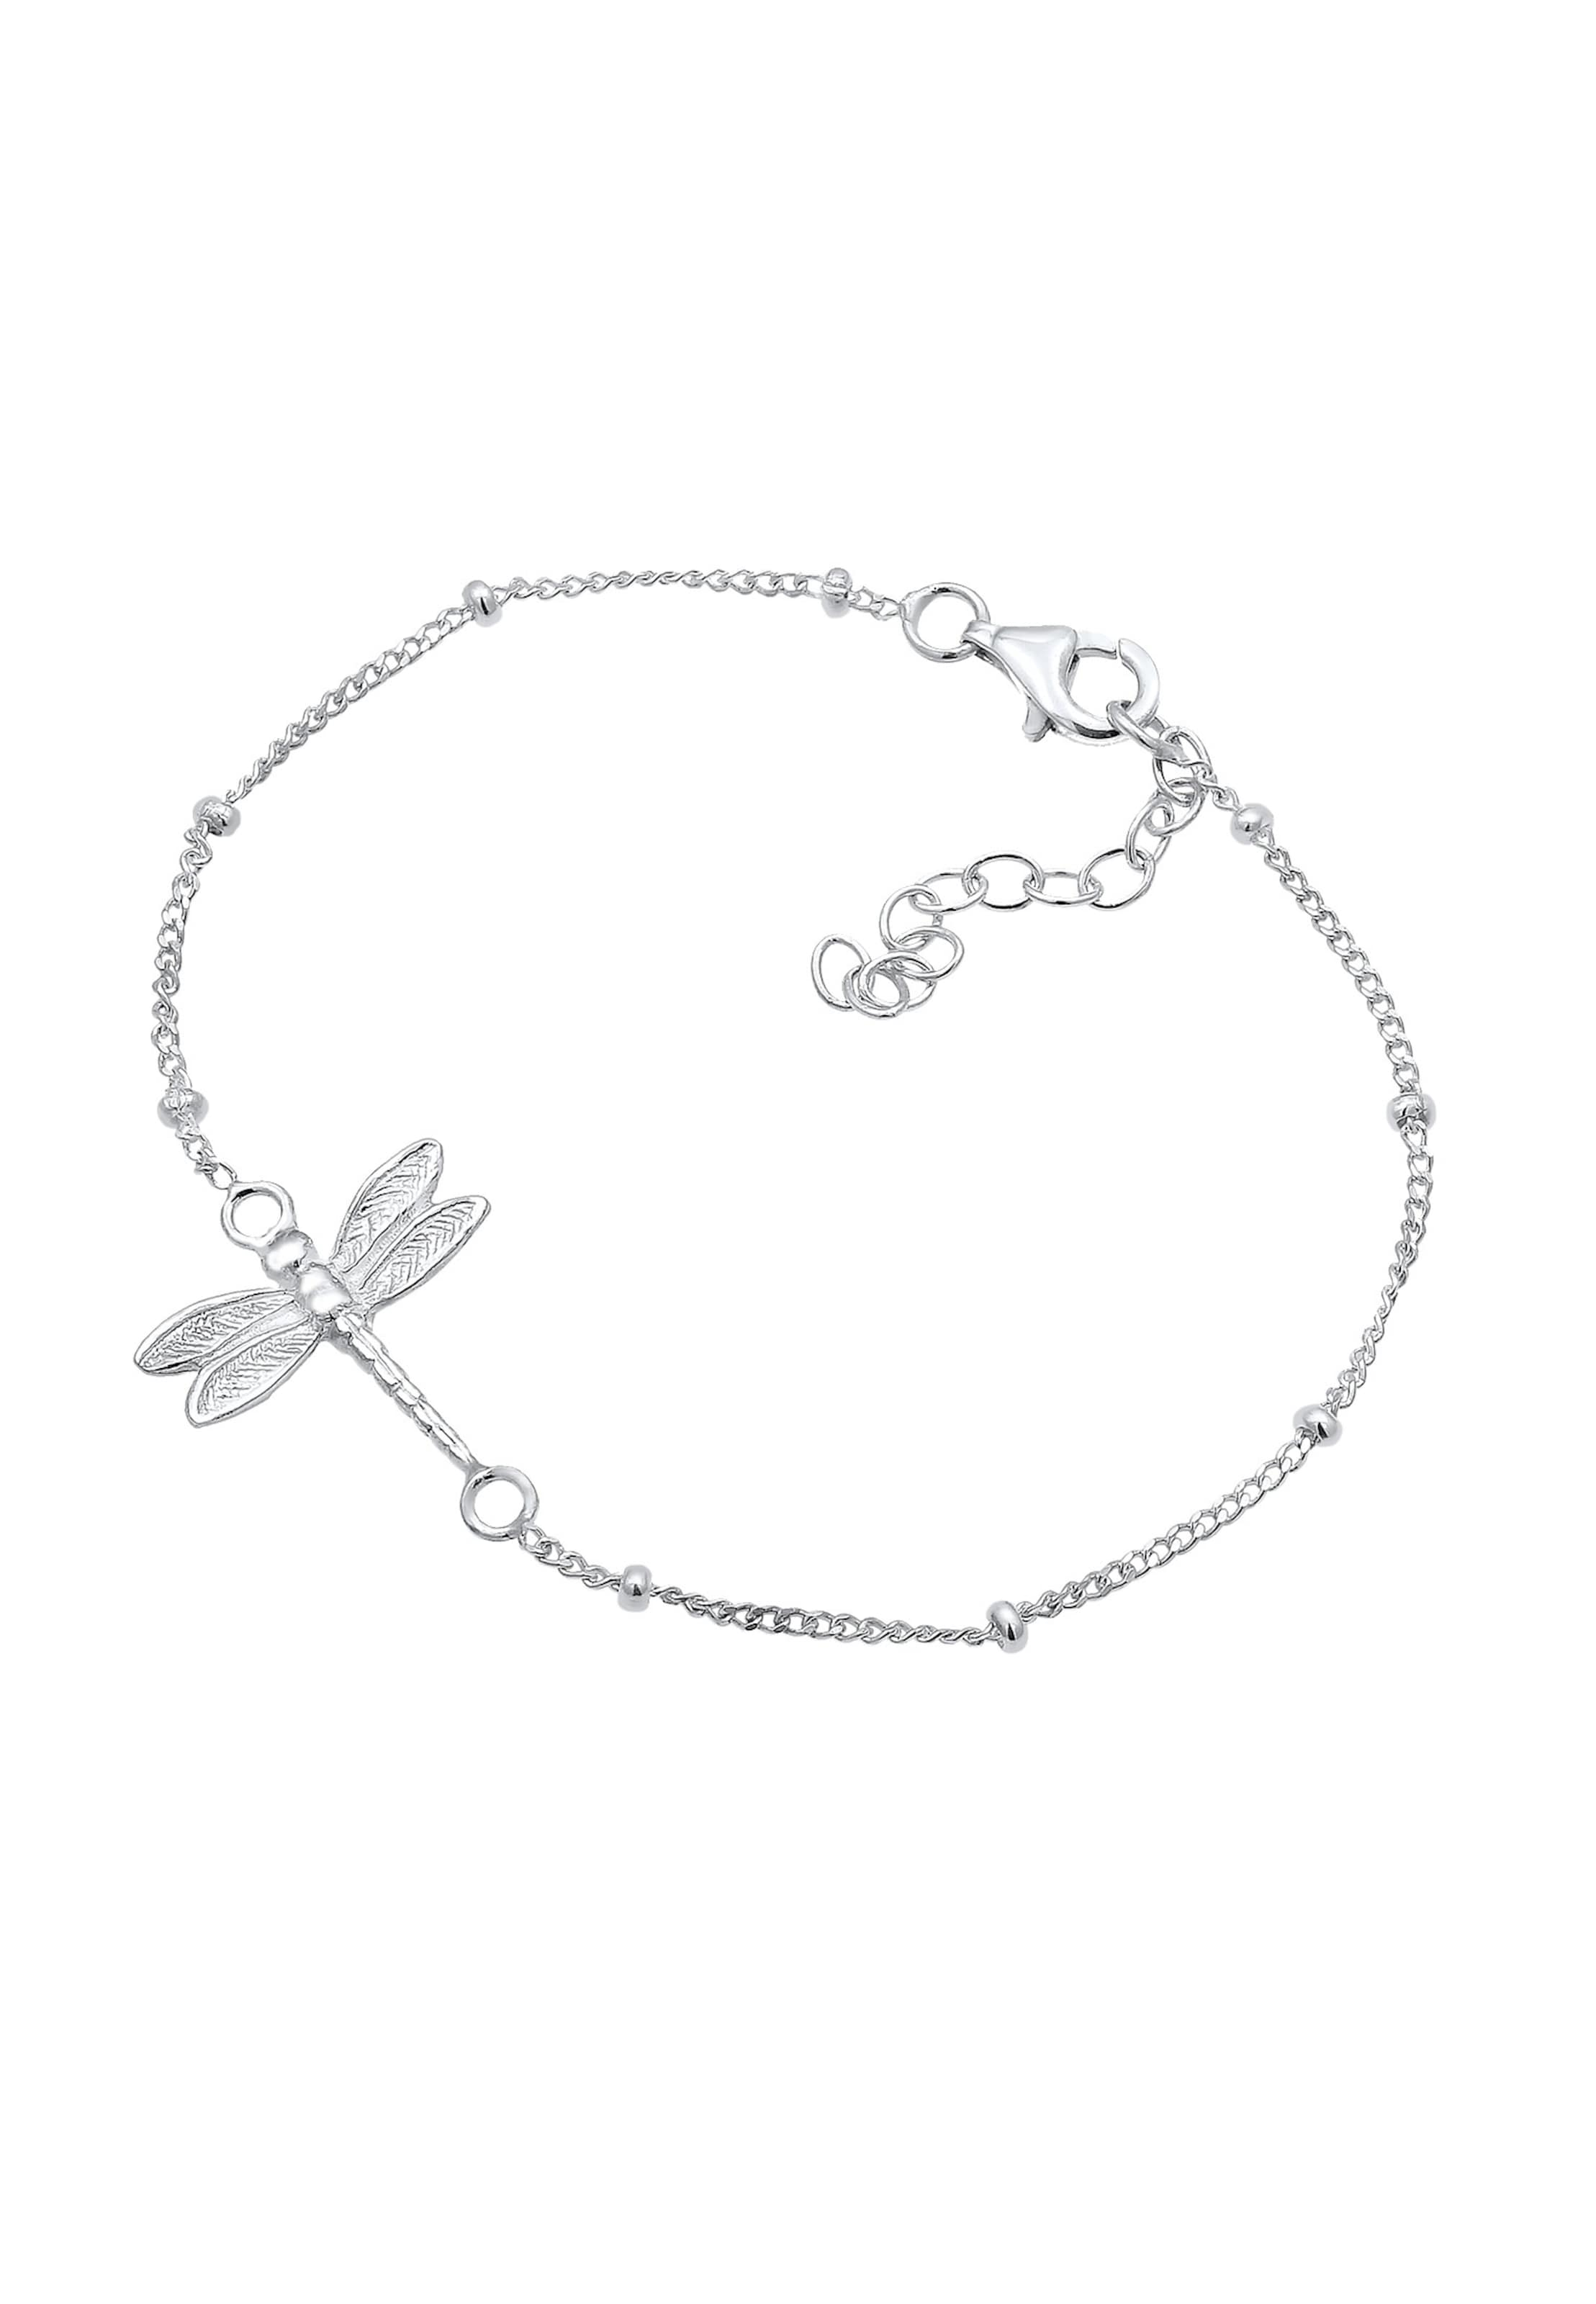 Armband Silber Silber 'libelle' In Elli Armband In Elli 'libelle' lK3uJF51Tc